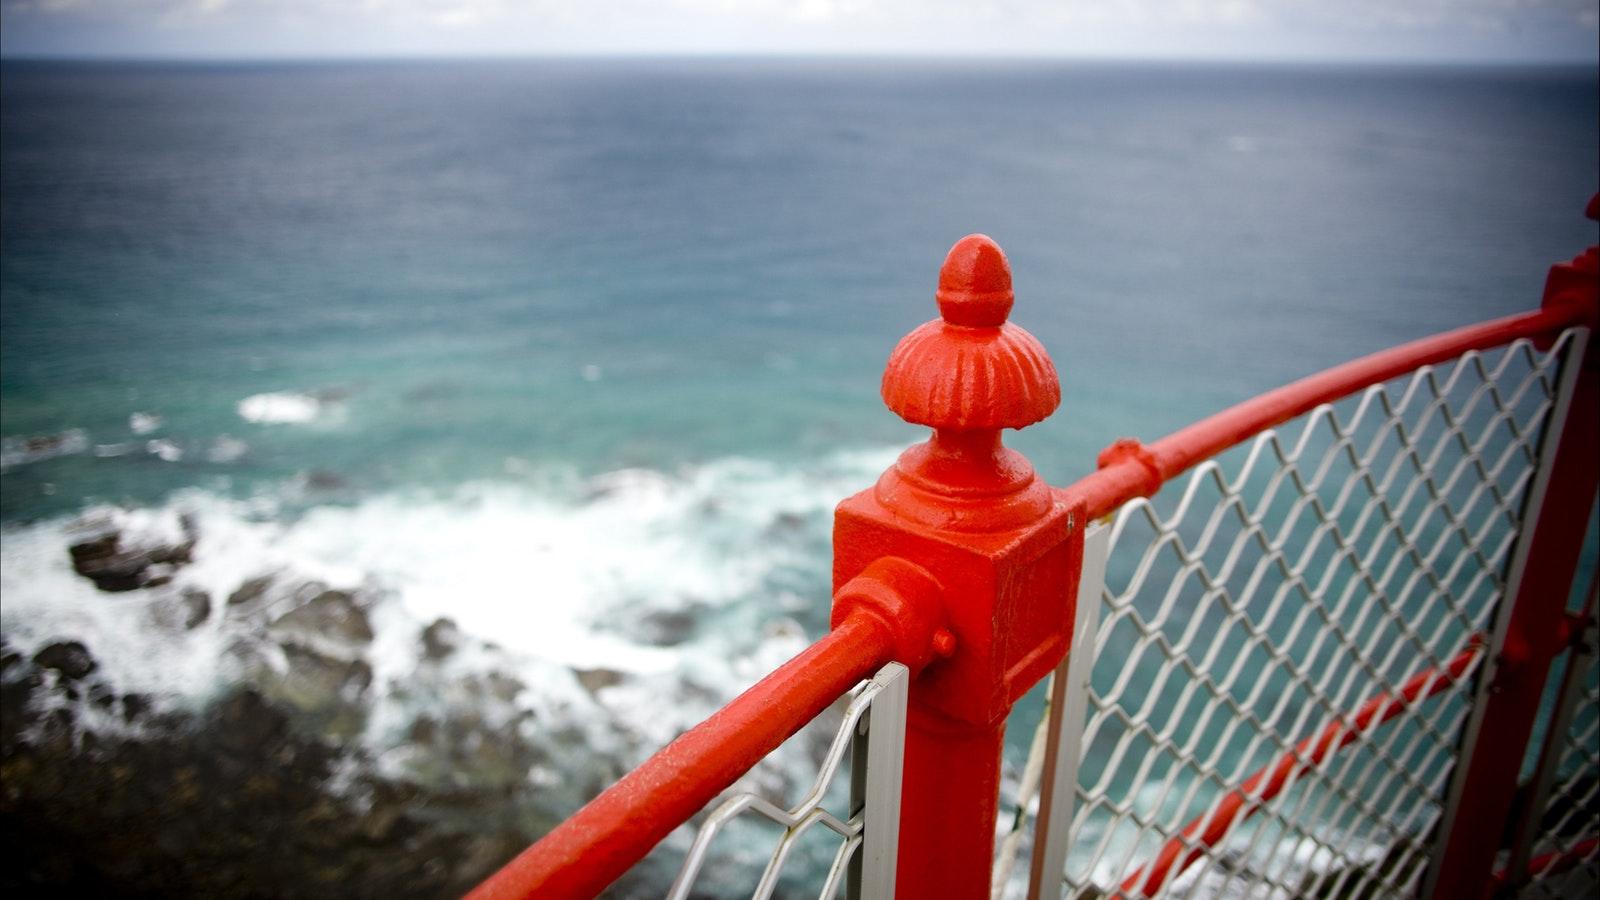 Ocean view on Cape Otway light house